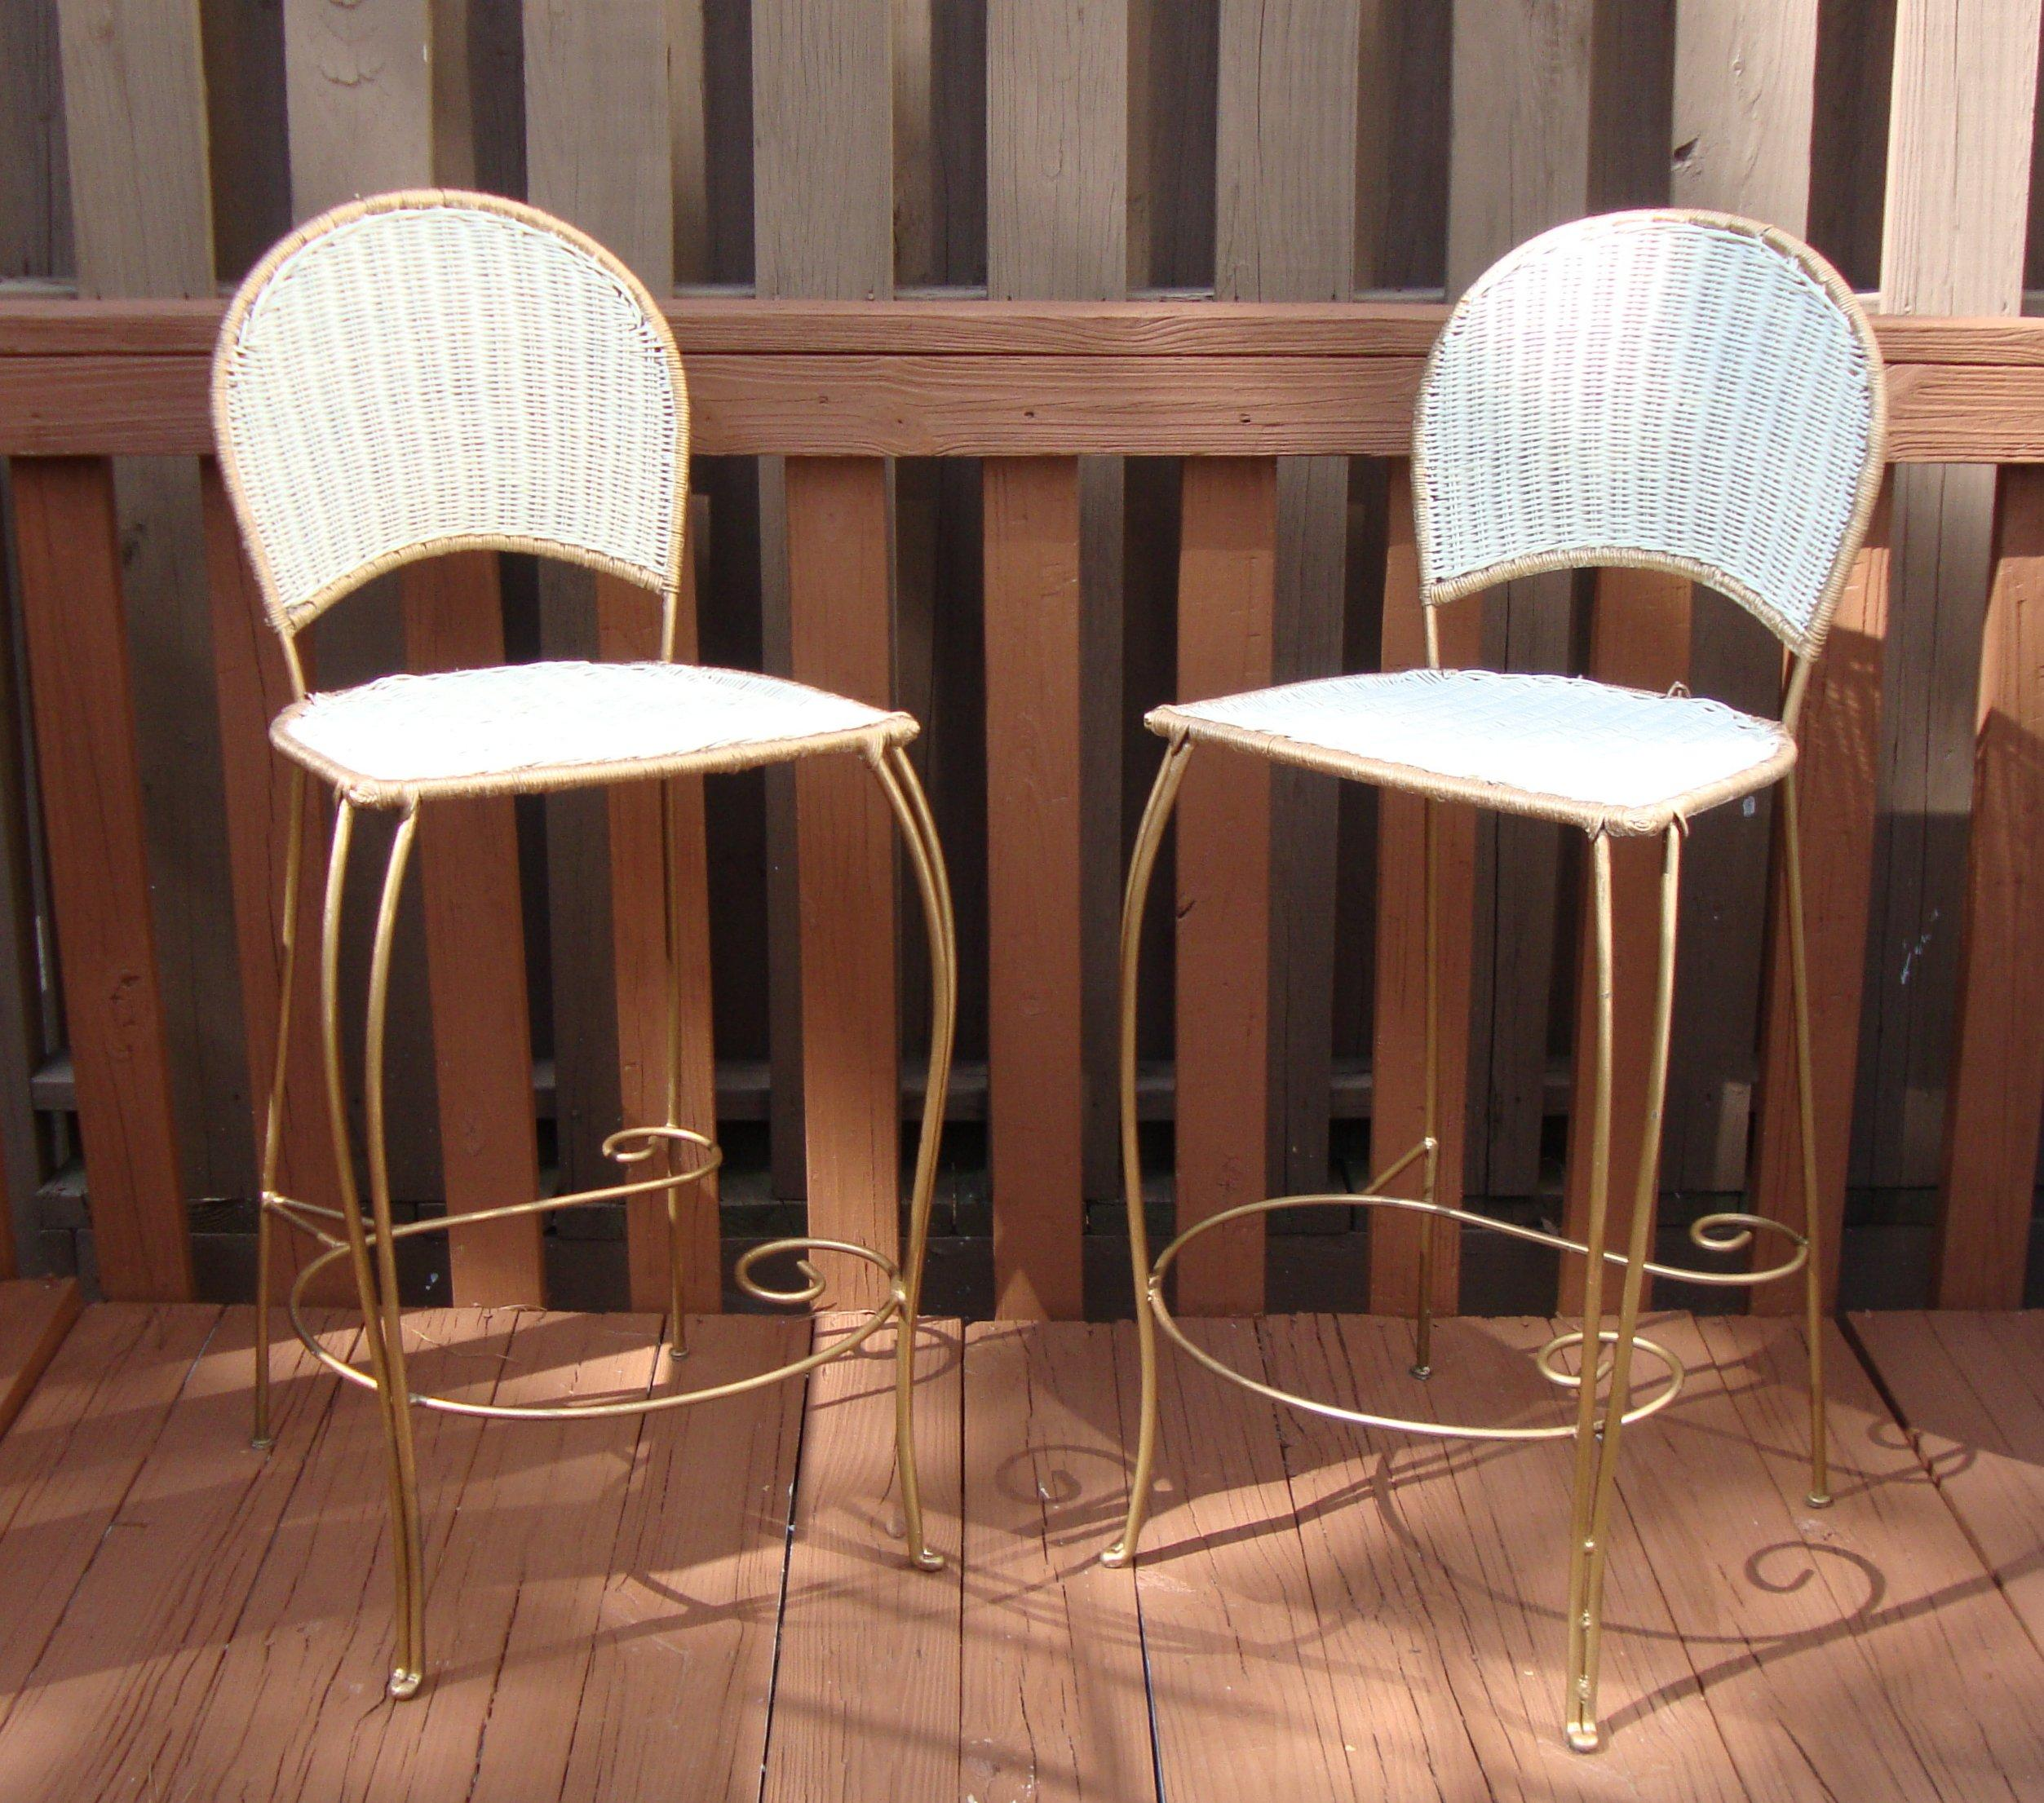 Vintage Style White Wicker Bar Stools Pair Chairish